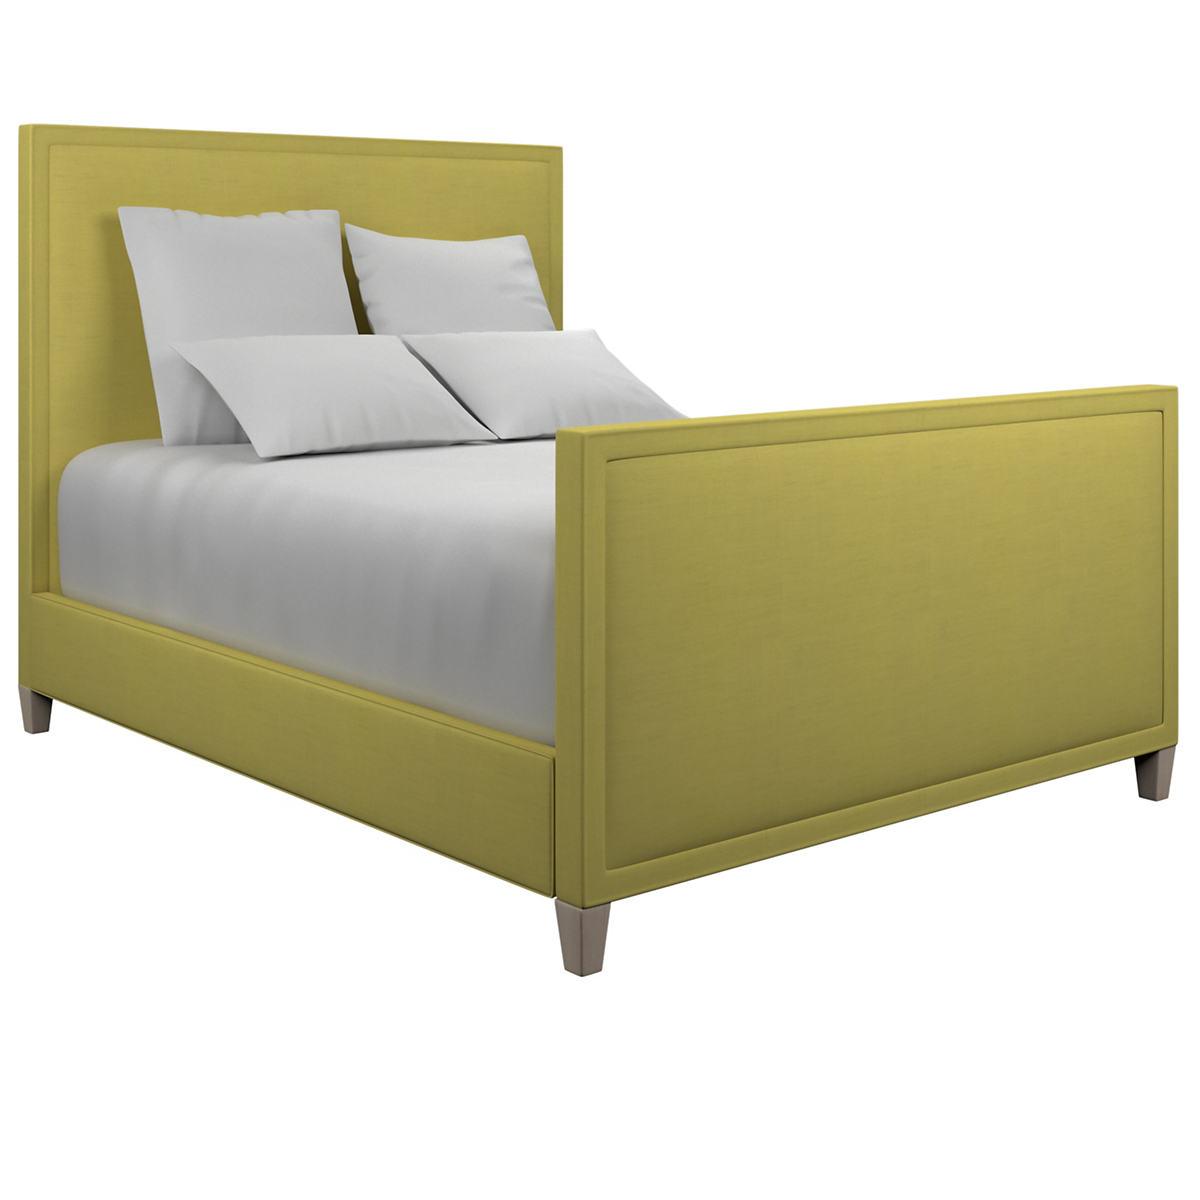 Estate Linen Citrus Colebrook Whitewash Bed